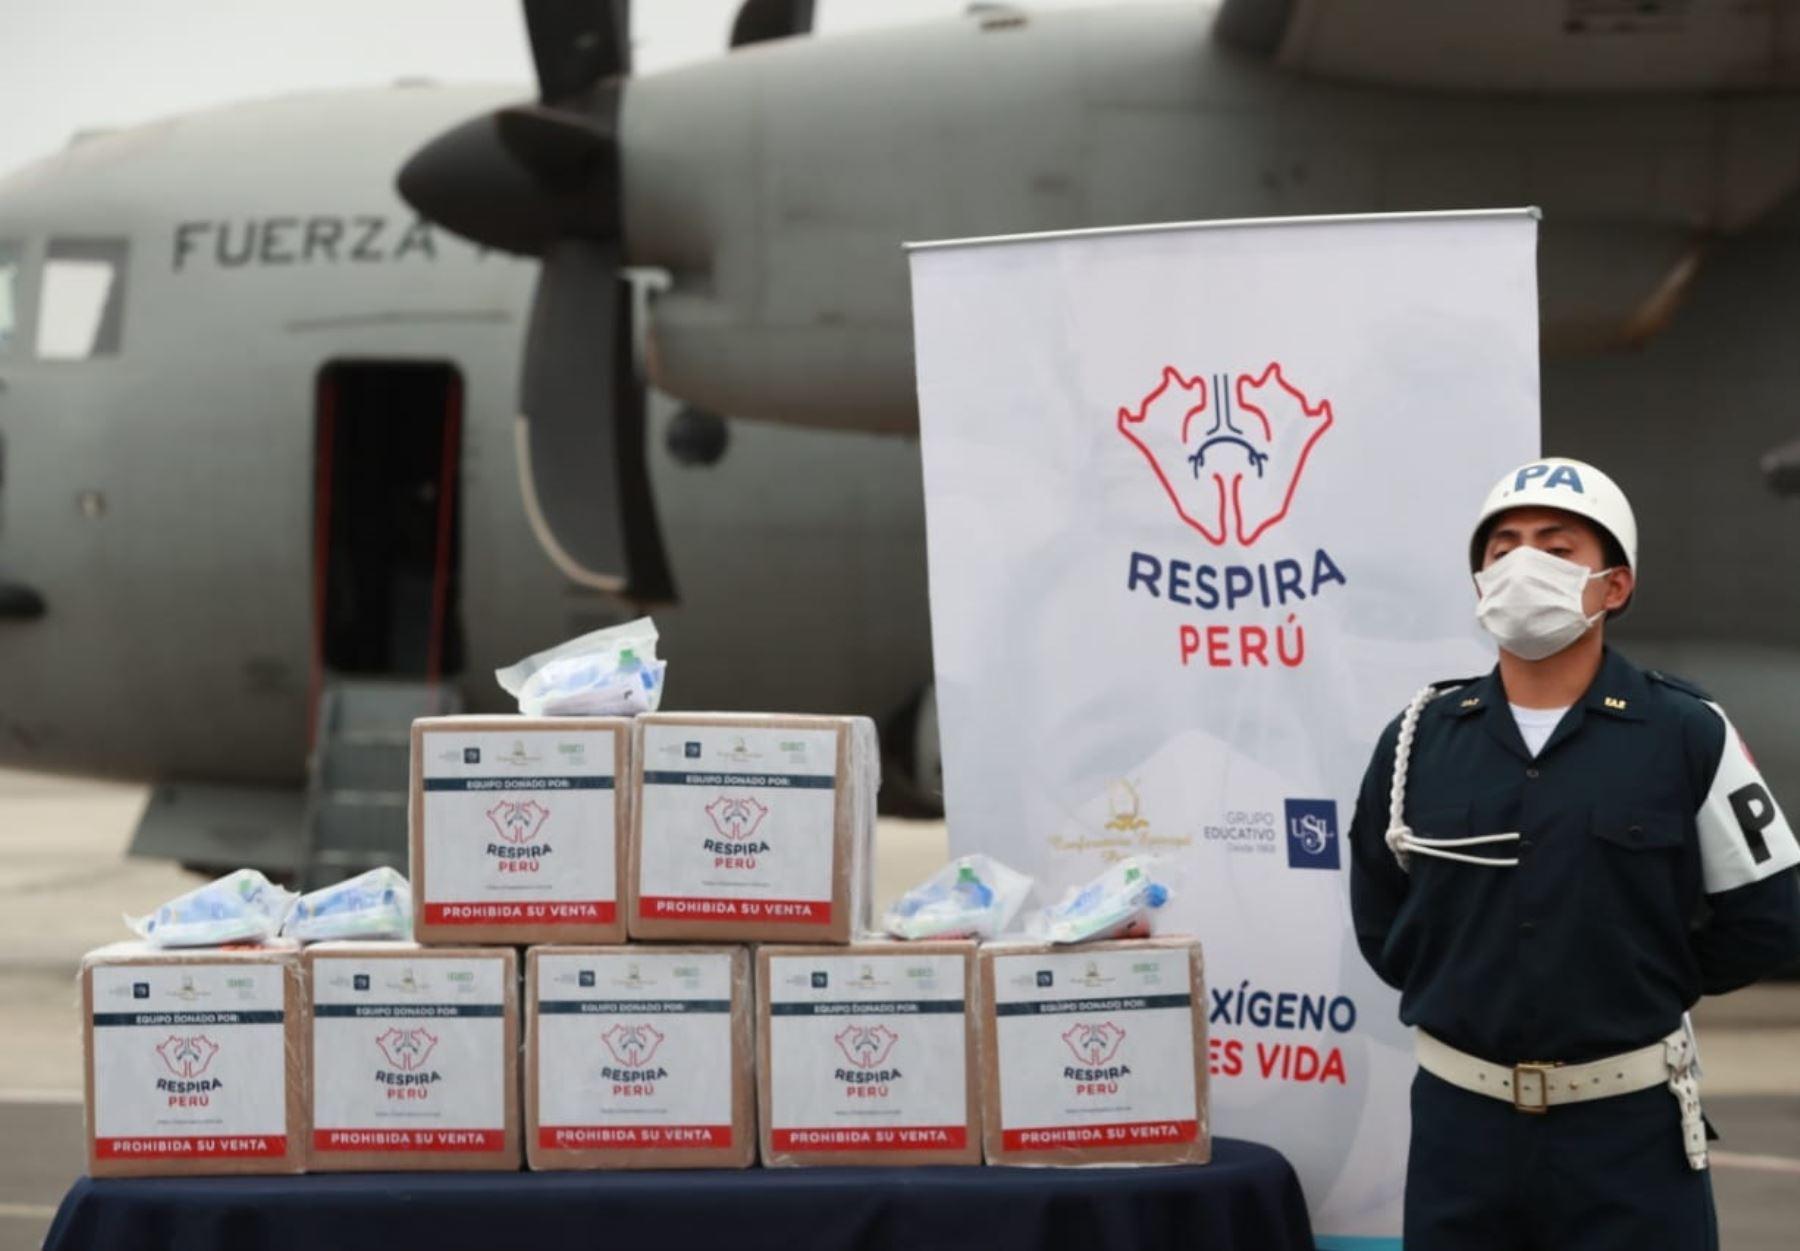 Ventiladores mecánicos de uso temporal, donados por Respira Perú, irán a Cajamarca, Moquegua y Tacna para reforzar lucha contra el coronavirus. ANDINA/Jhonel Rodríguez Robles